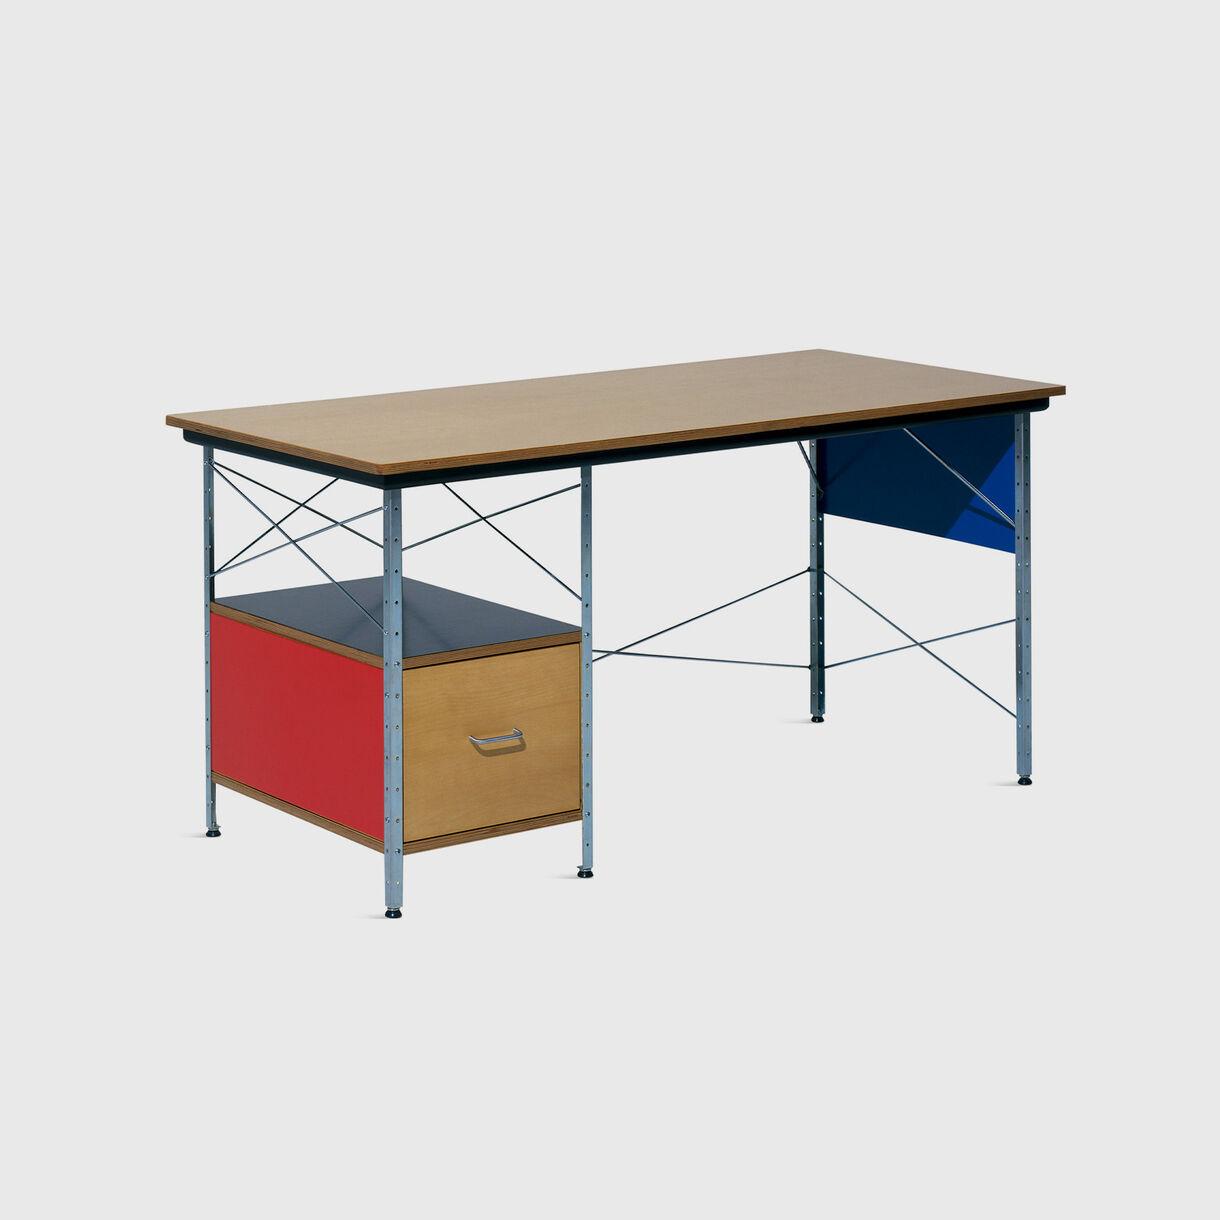 Eames Desk Unit, LH File Storage Drawer